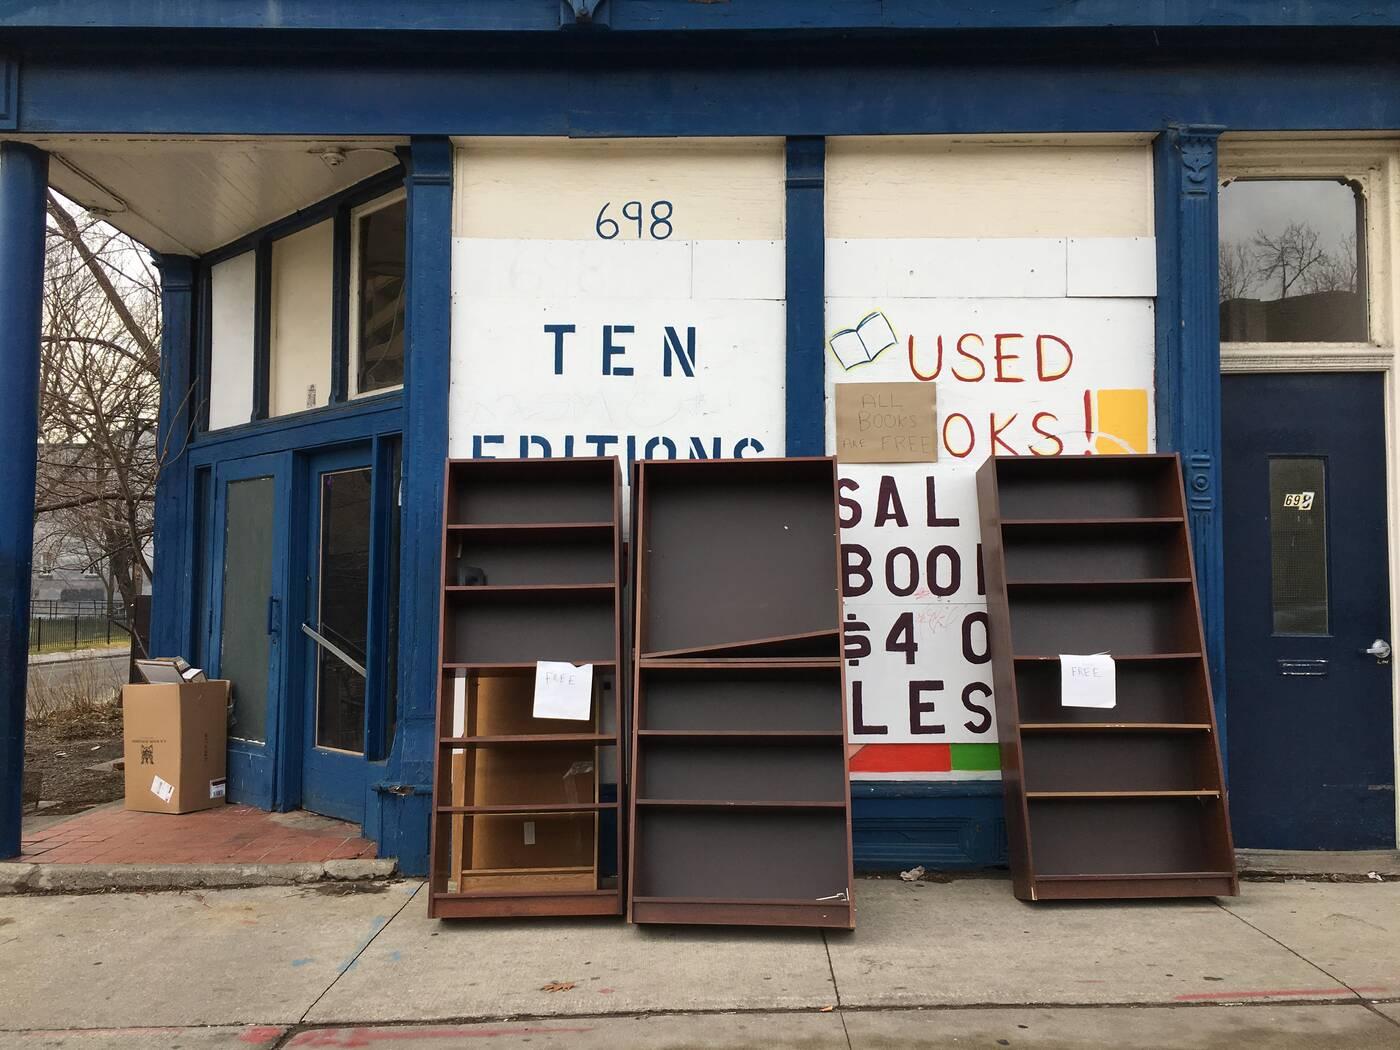 ten editions bookstore